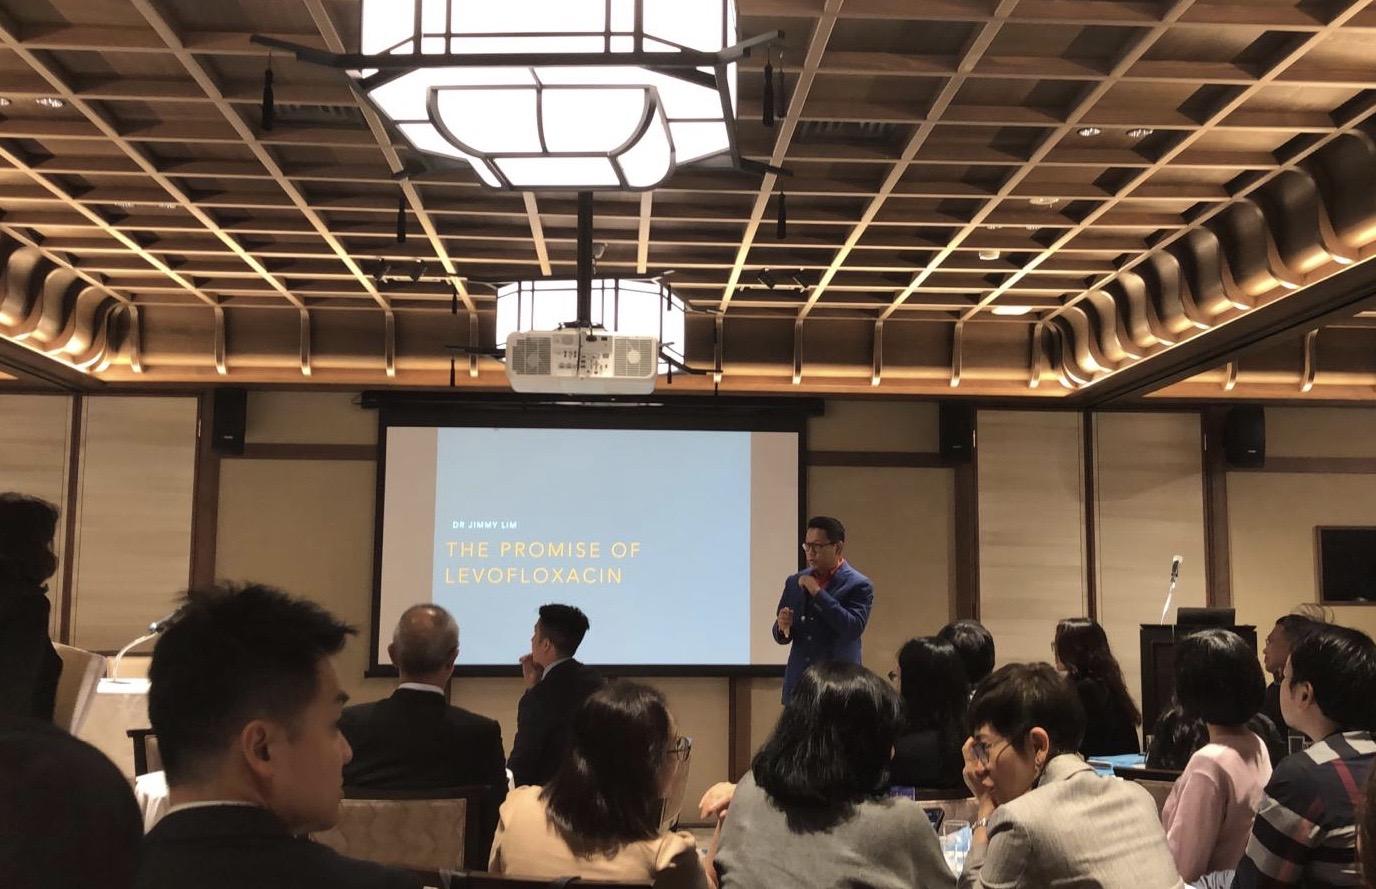 The Promise of Levofloxacin, Santen Dinner Symposium, Kyoto, Japan